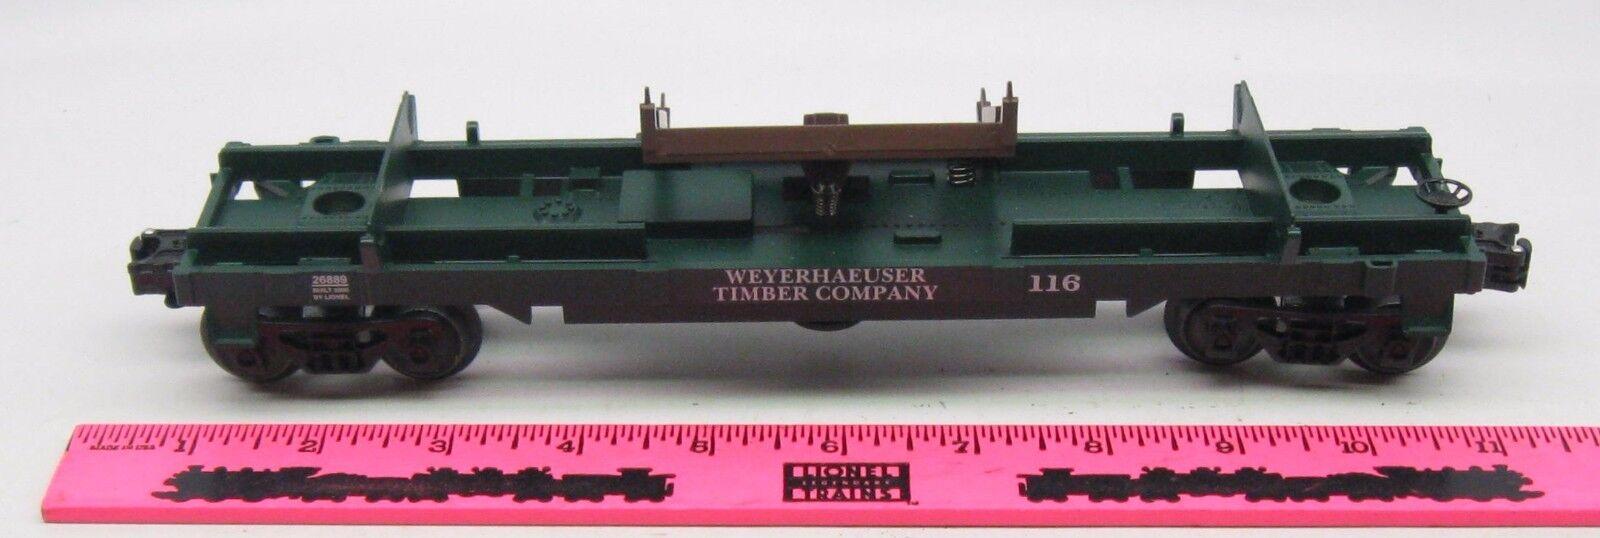 Lionel 26889 Weyerhauser Timber Company 116 log car